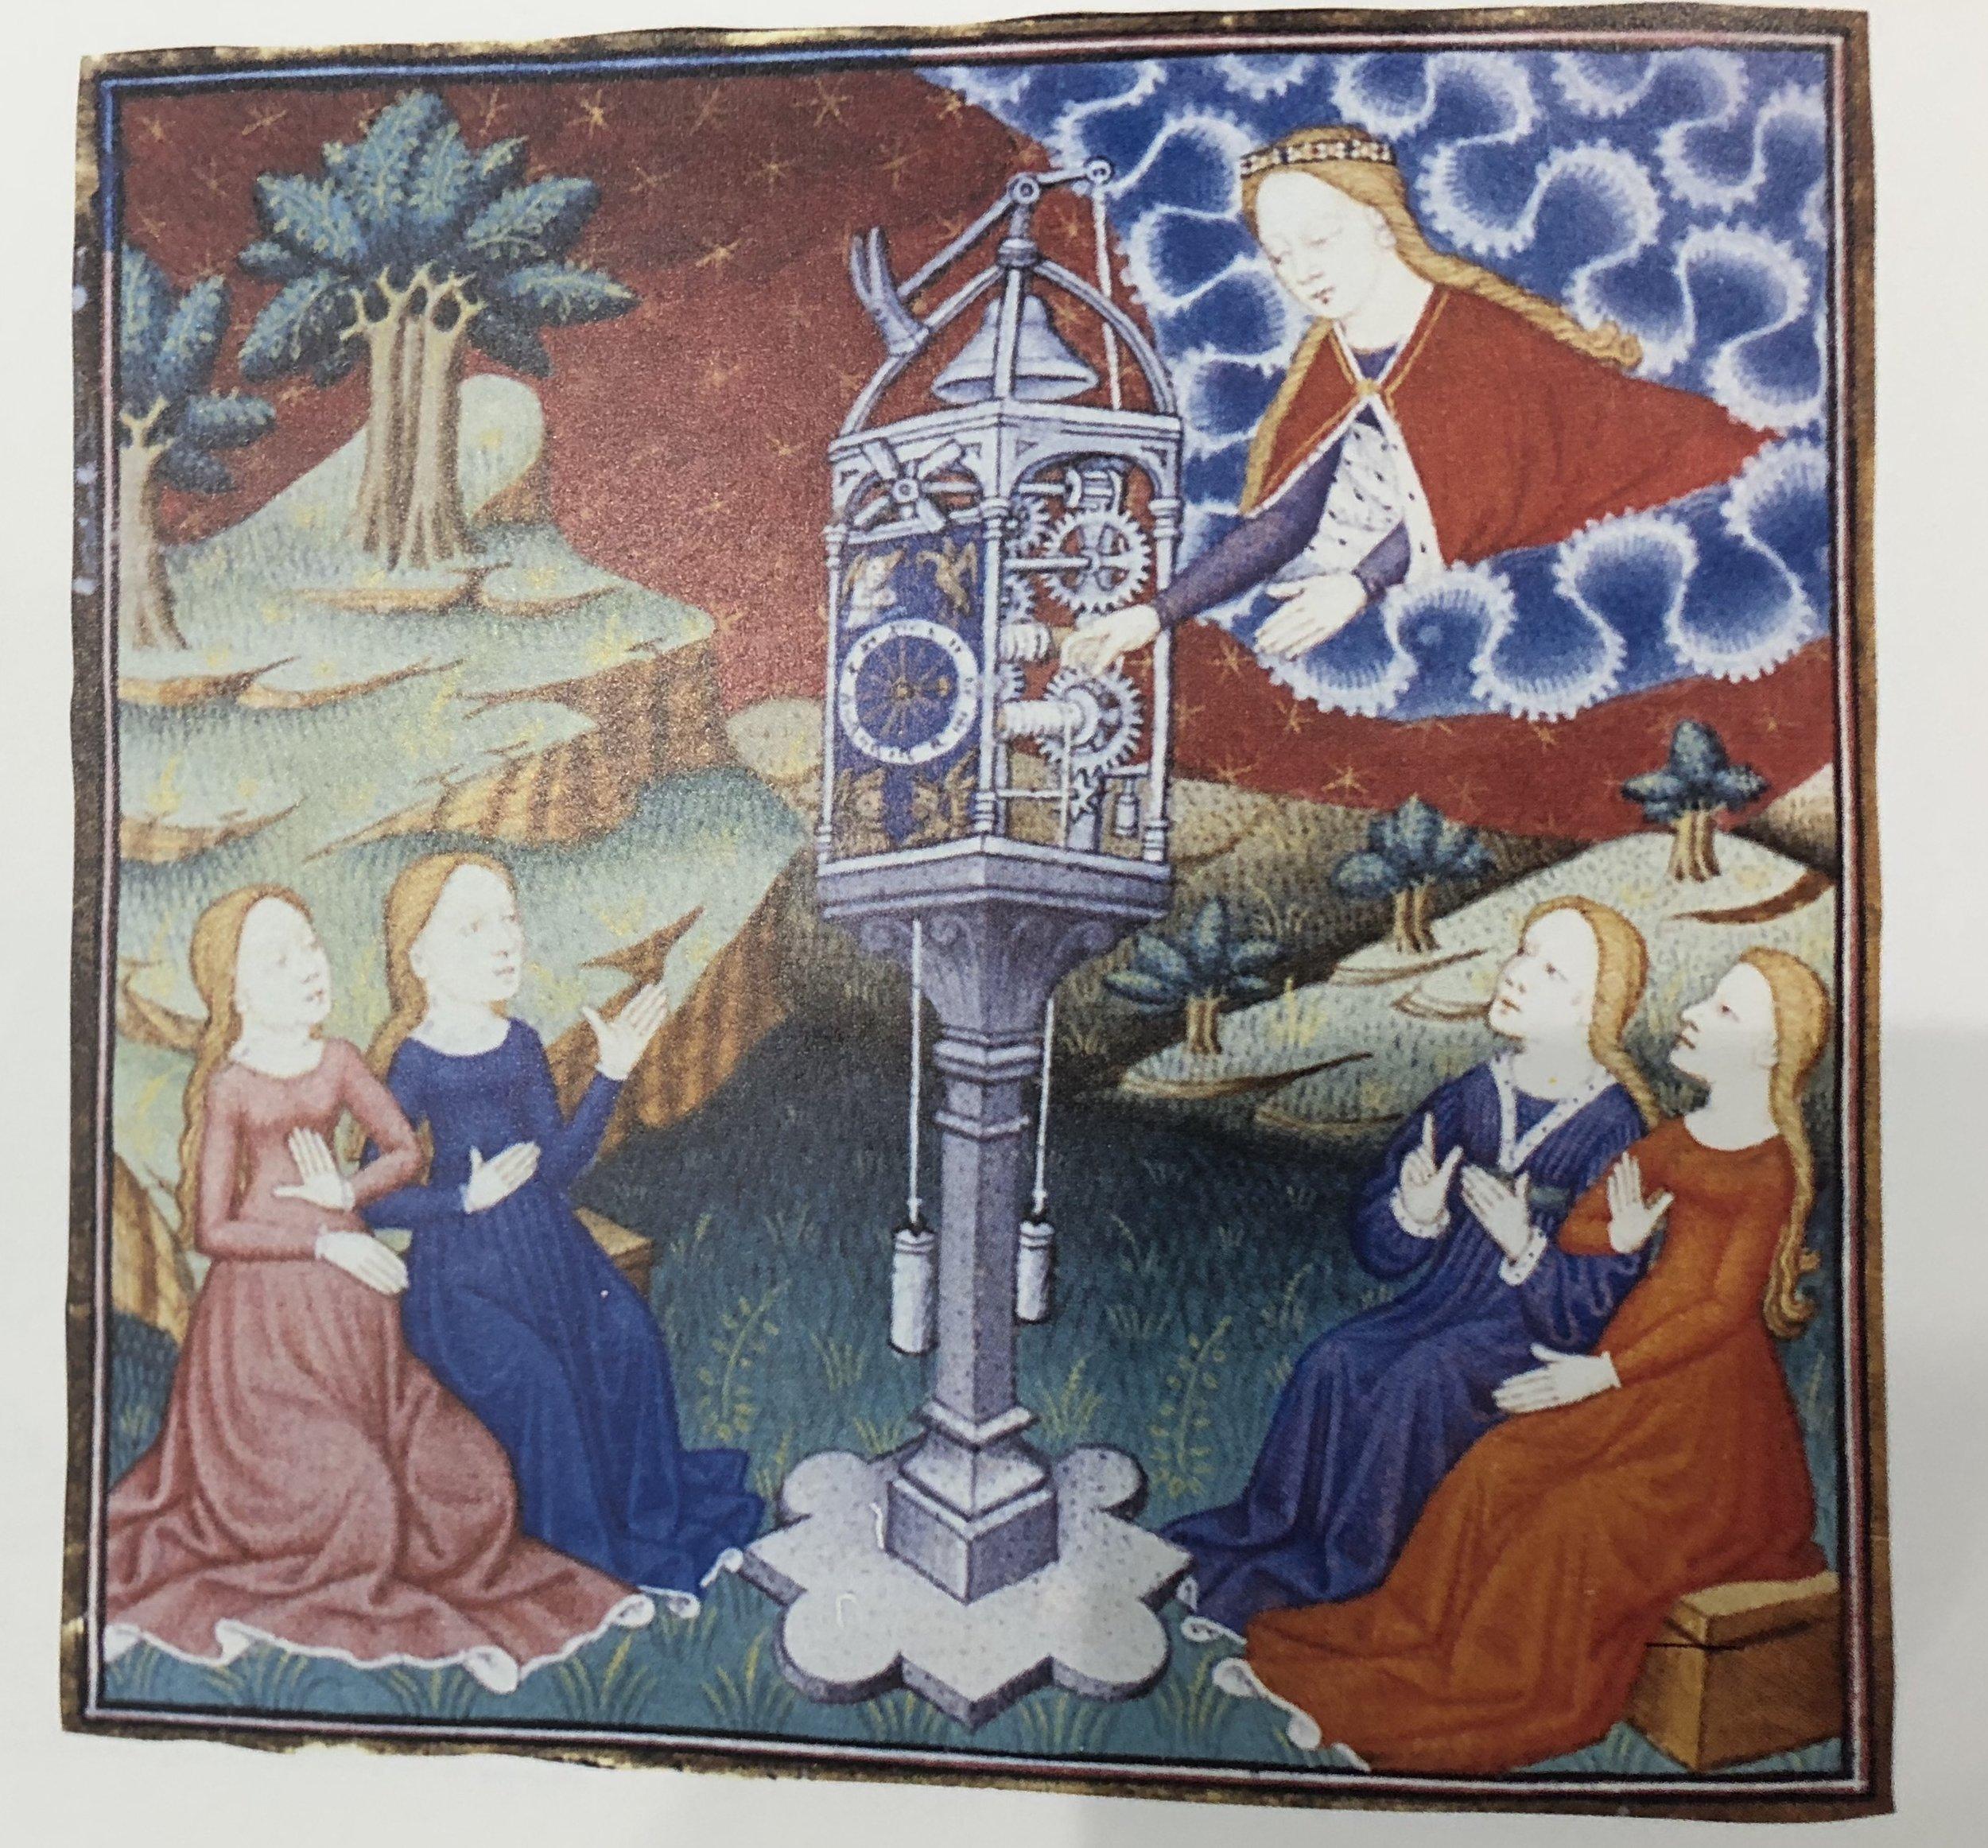 Image: an illustration in de Pisan's  Epitre d'Orthea  - The goddess Temperance winding a clock